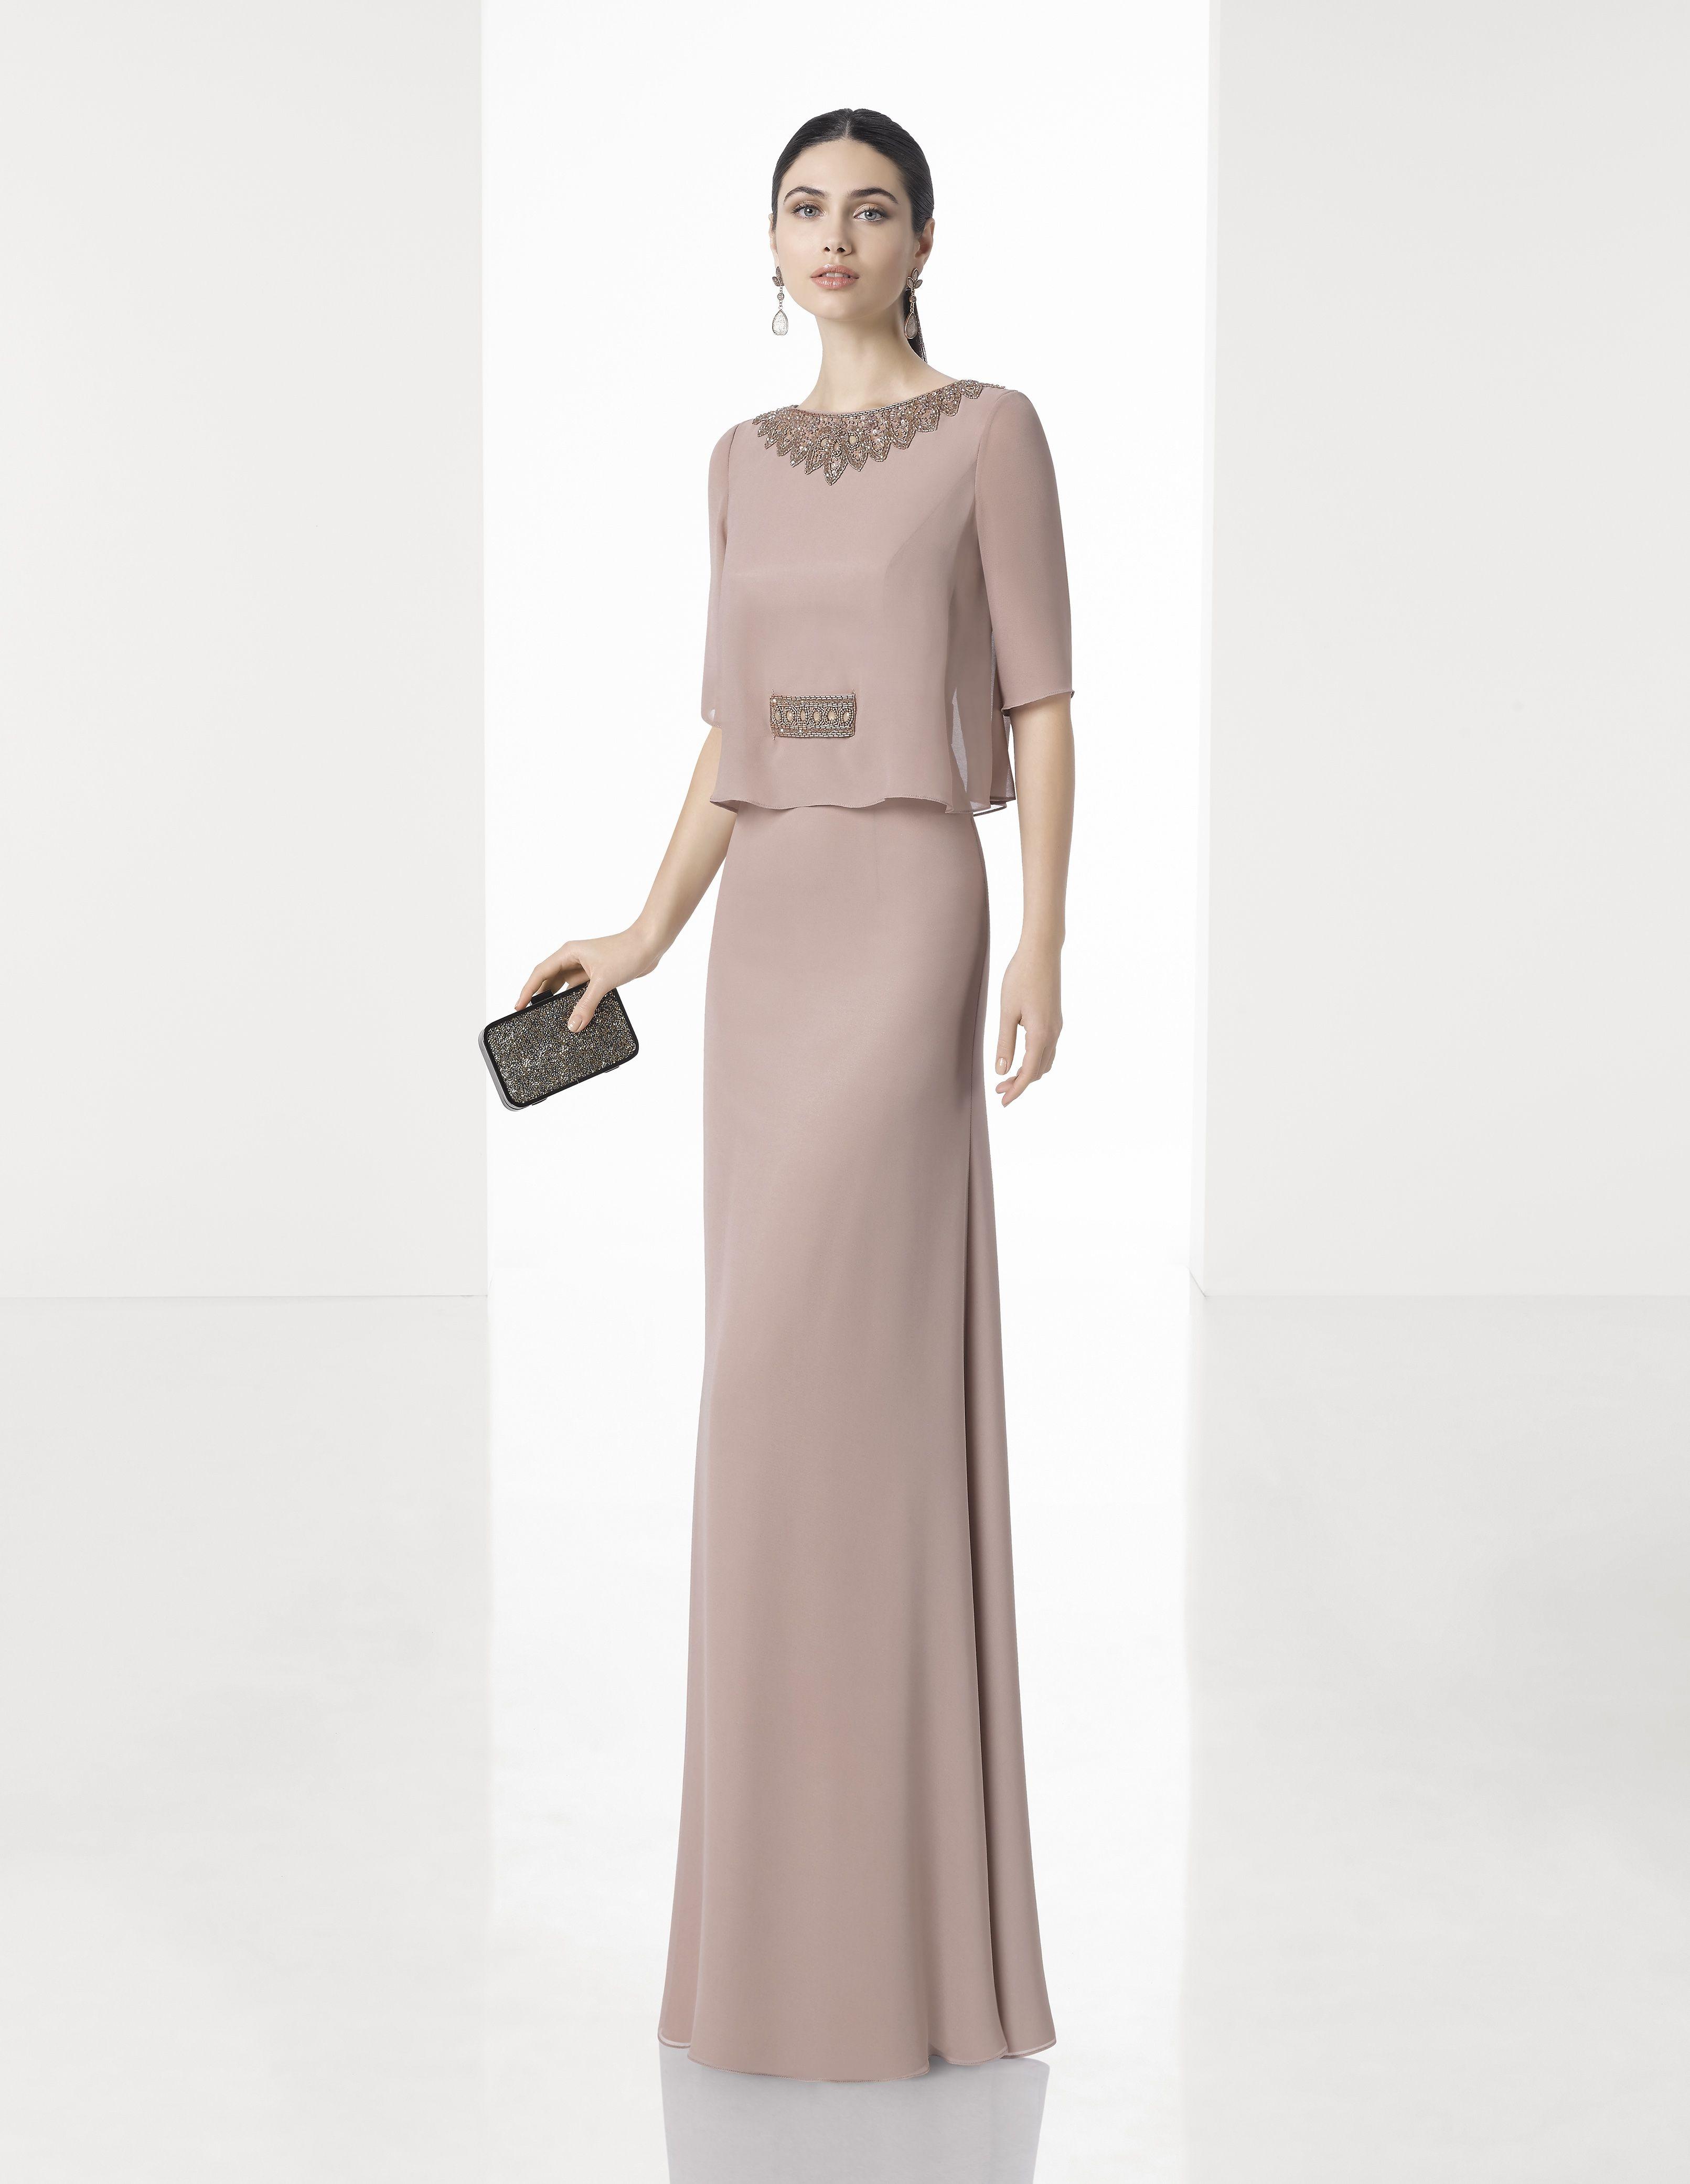 c41dbd66f Vestidos madrina boda rosa clara - Vestido azul